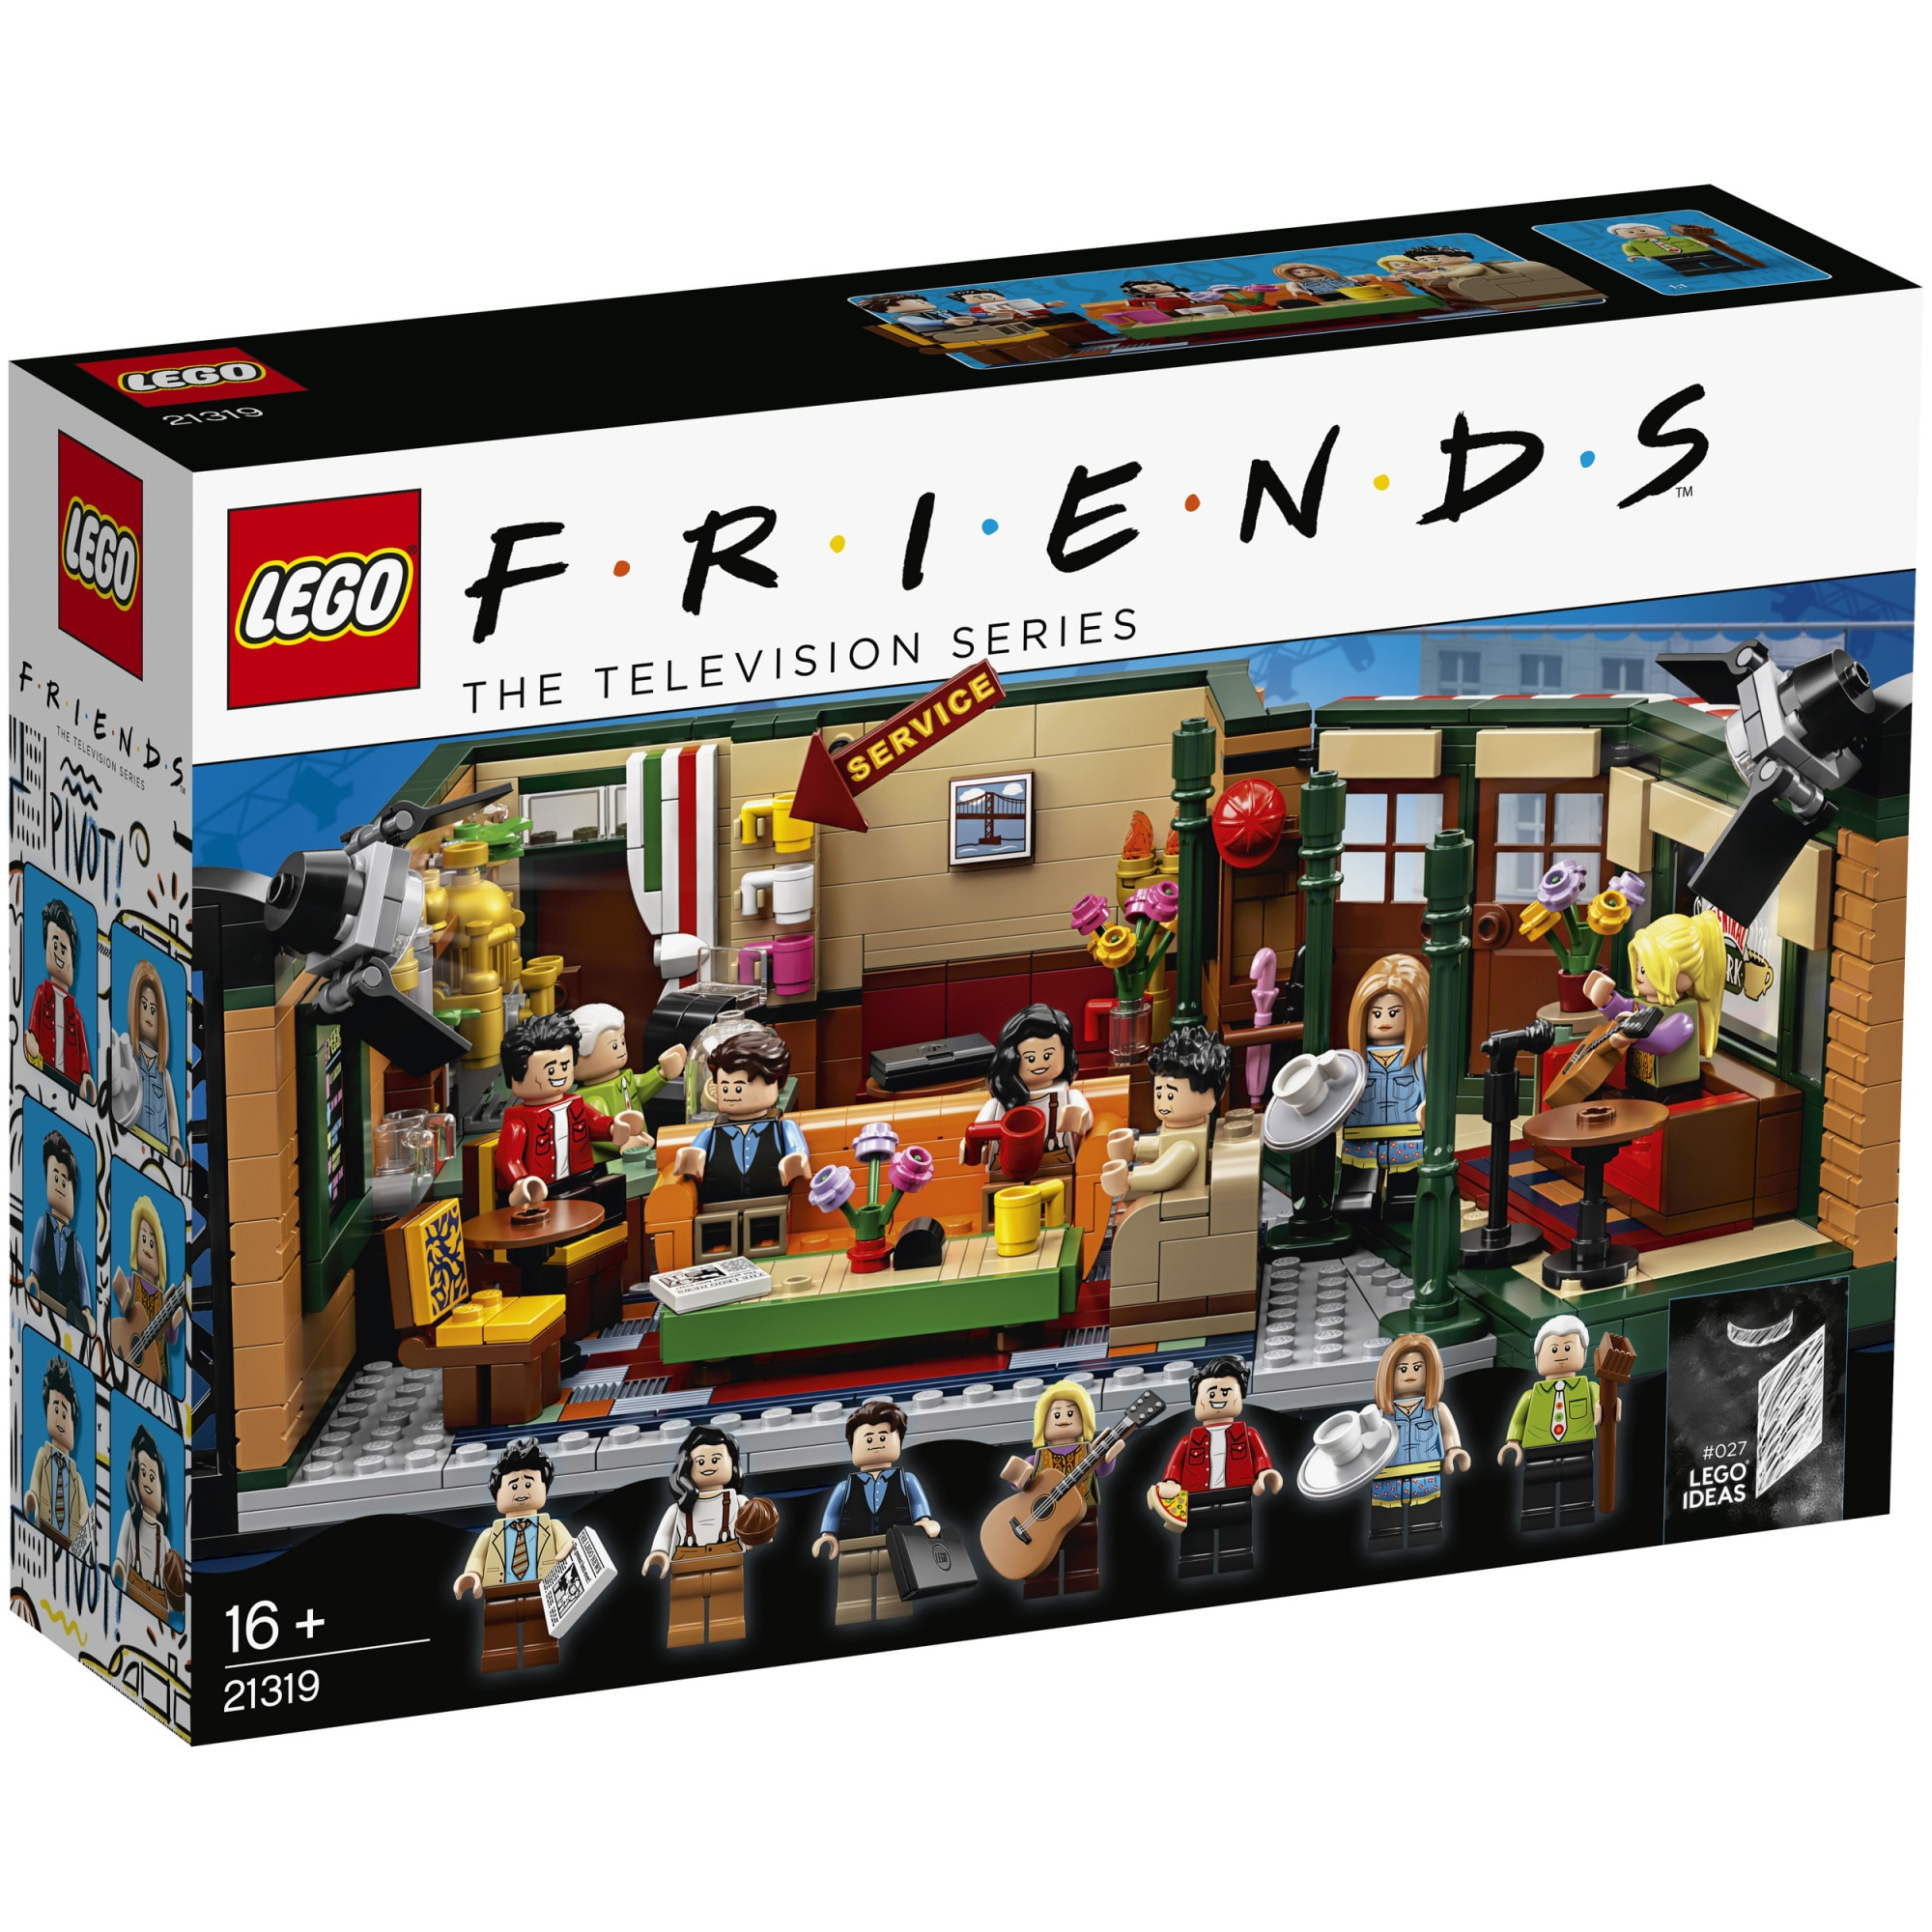 Fotografie LEGO Ideas - Central Perk 21319, 1070 piese